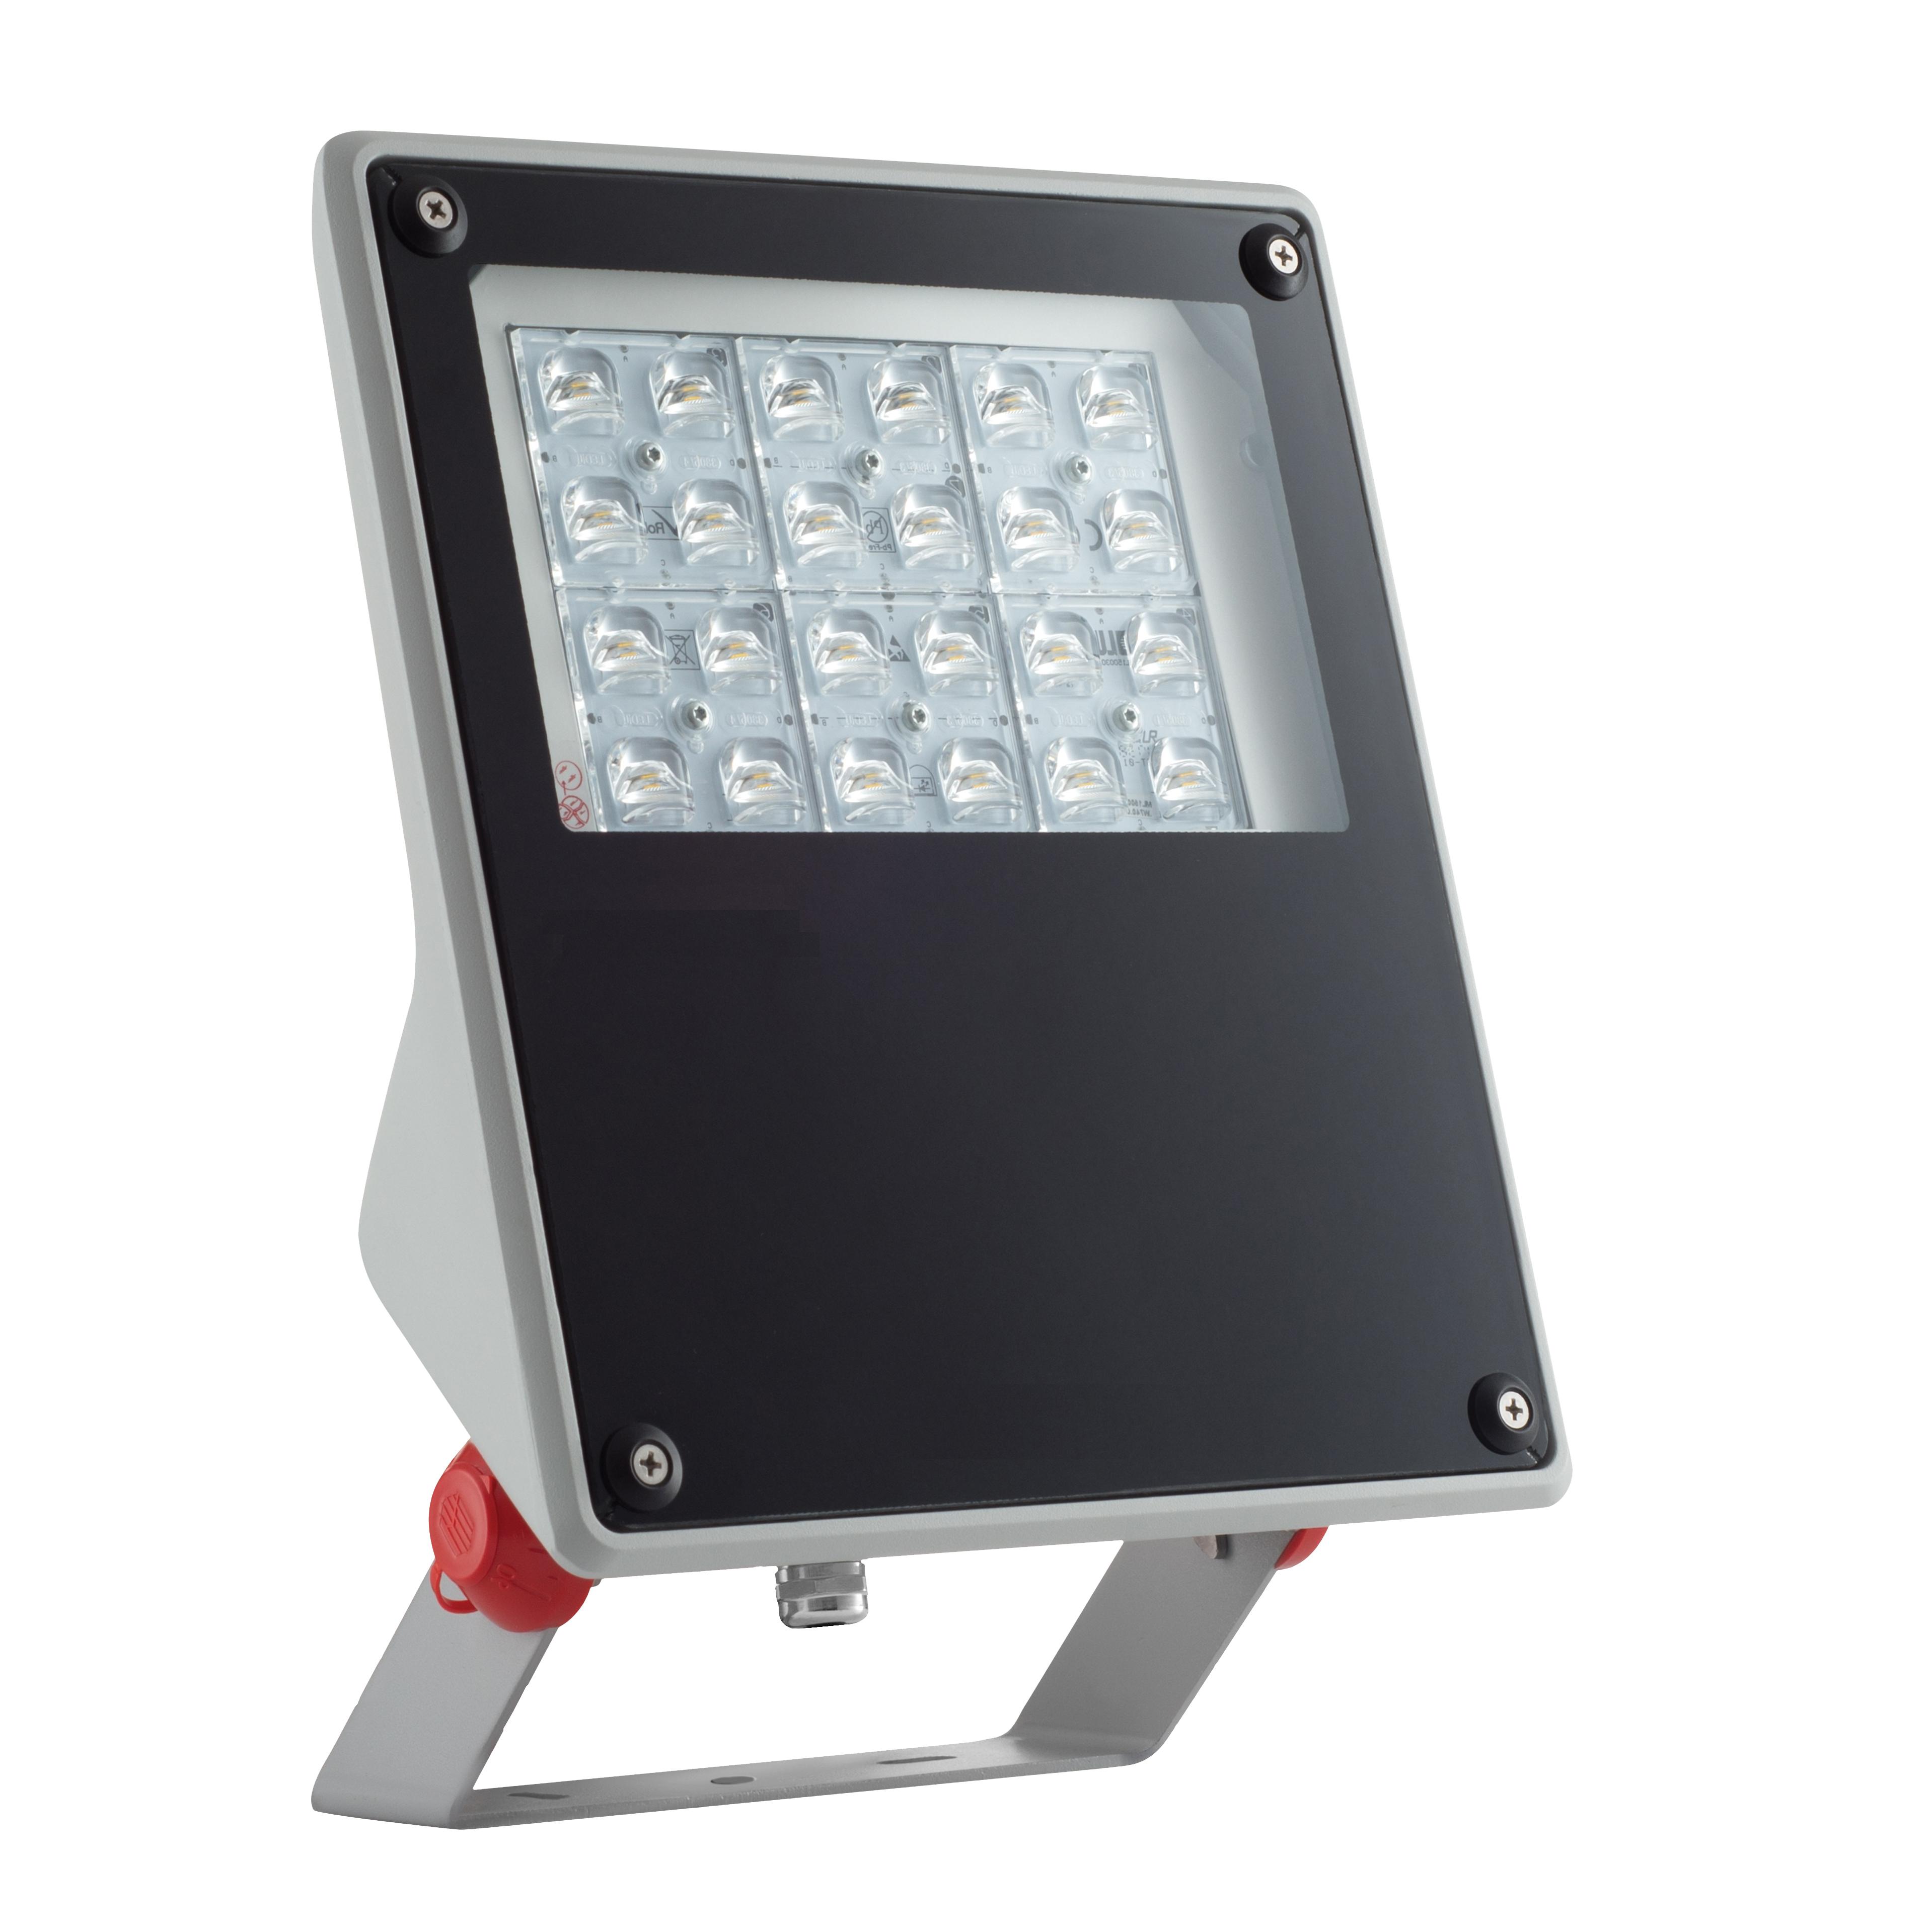 1 Stk FORCA LED Mini 57W 5650lm 4000K EVG IP65 asymmetrisch, grau LIG5L07141